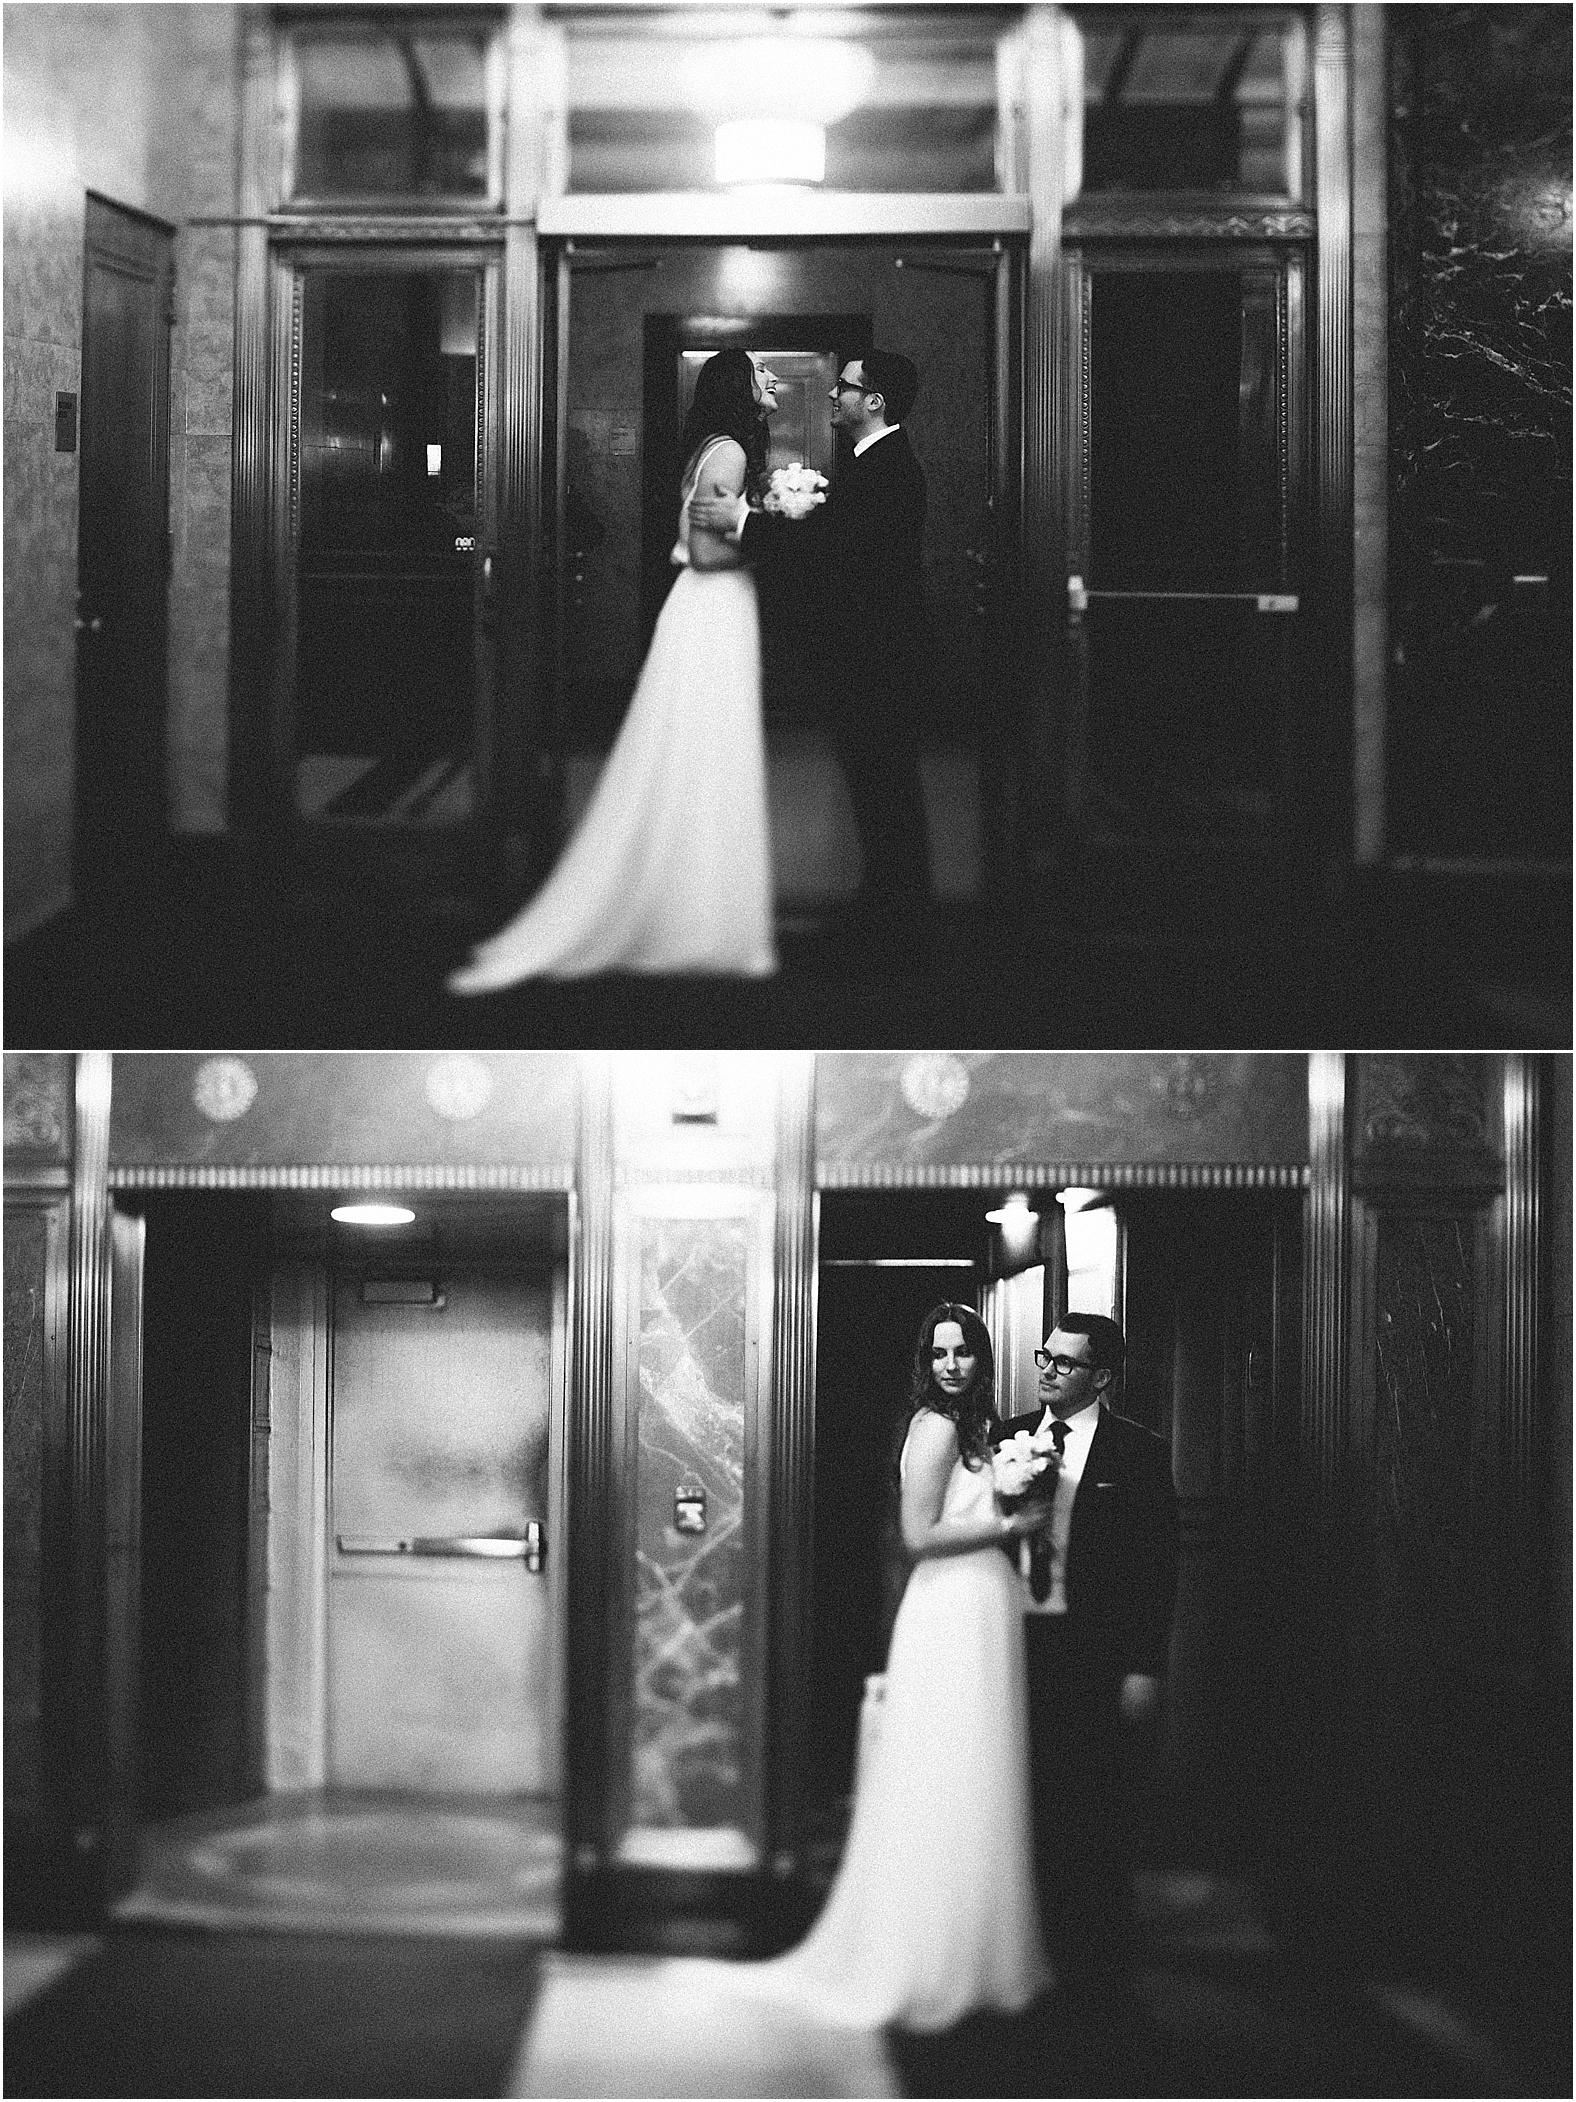 manzanita photo by rebecca caridad internation wedding photogrpaher, colorado wedding photographer, nashville wedding photographer_0613.jpg